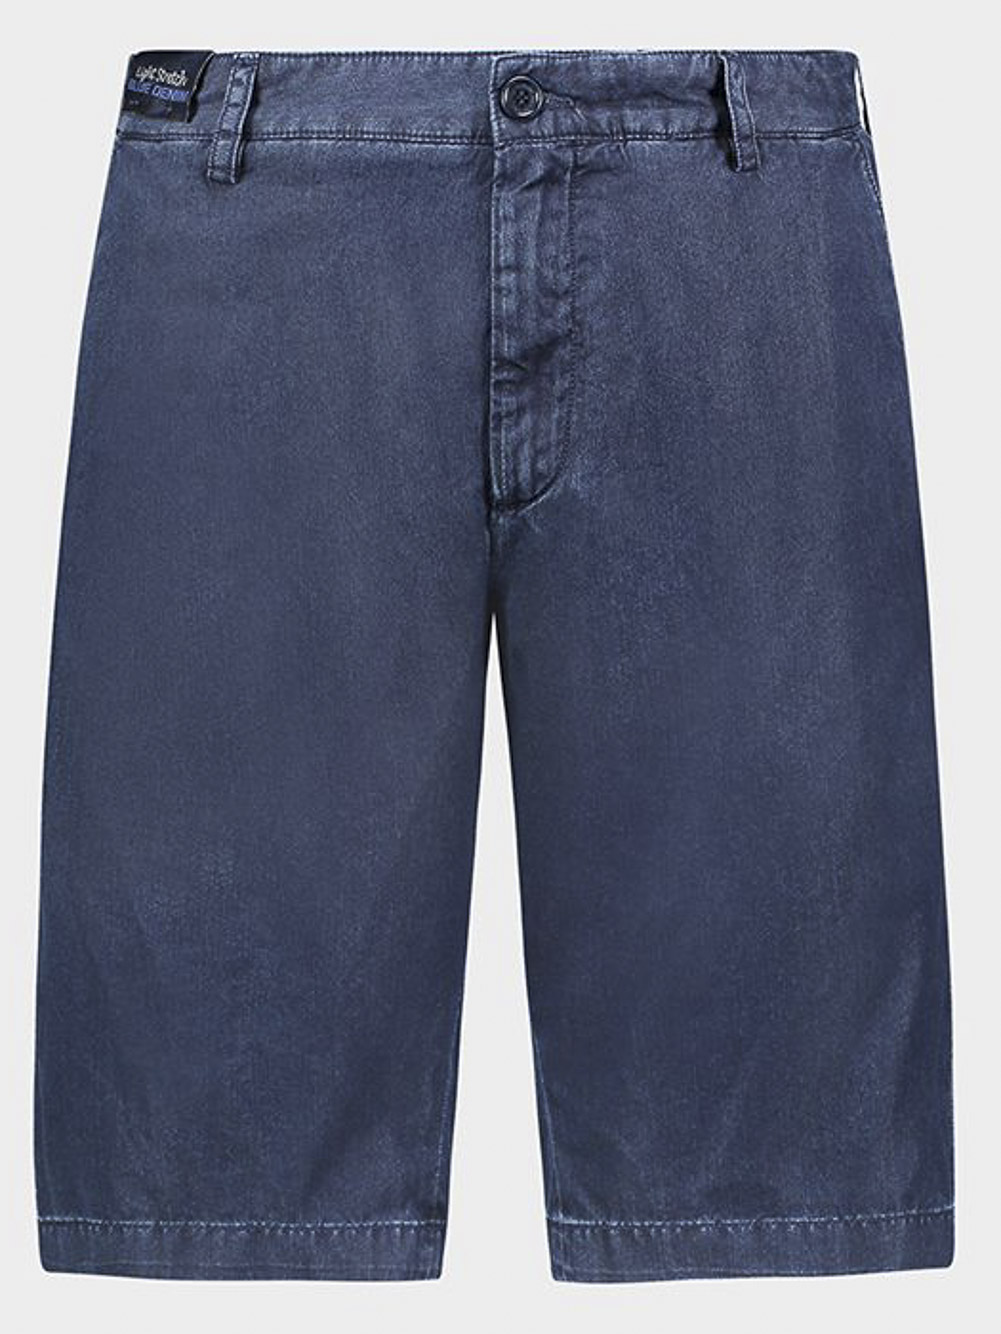 PAUL & SHARK Βερμούδα με πλαινές τσέπες E20P4200-013 ΤΖΙΝ